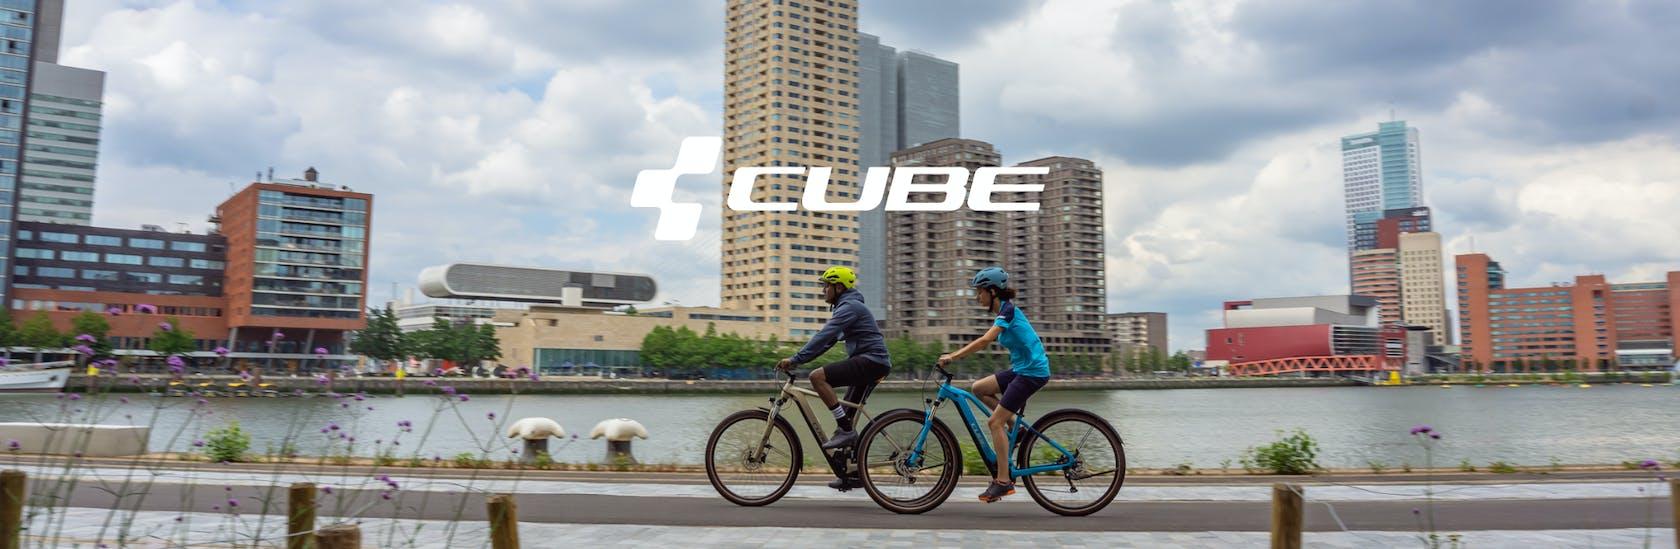 Cube shop online biciclette, ricambi e accessori bici